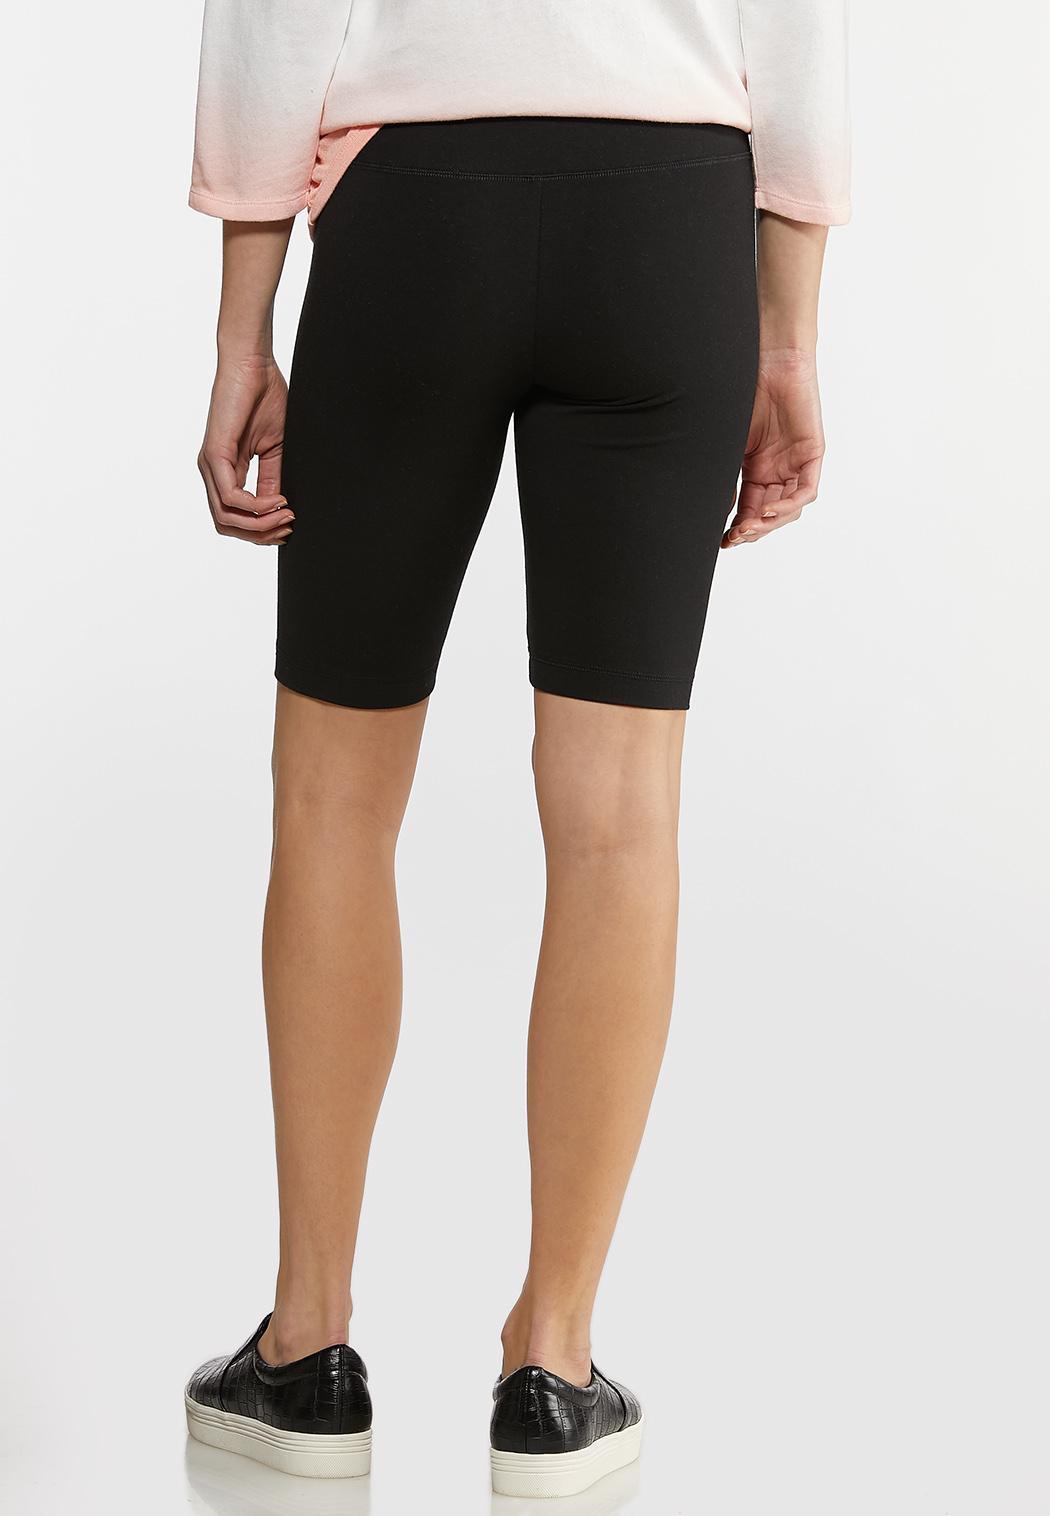 Pull-On Stretch Biker Shorts (Item #44592510)